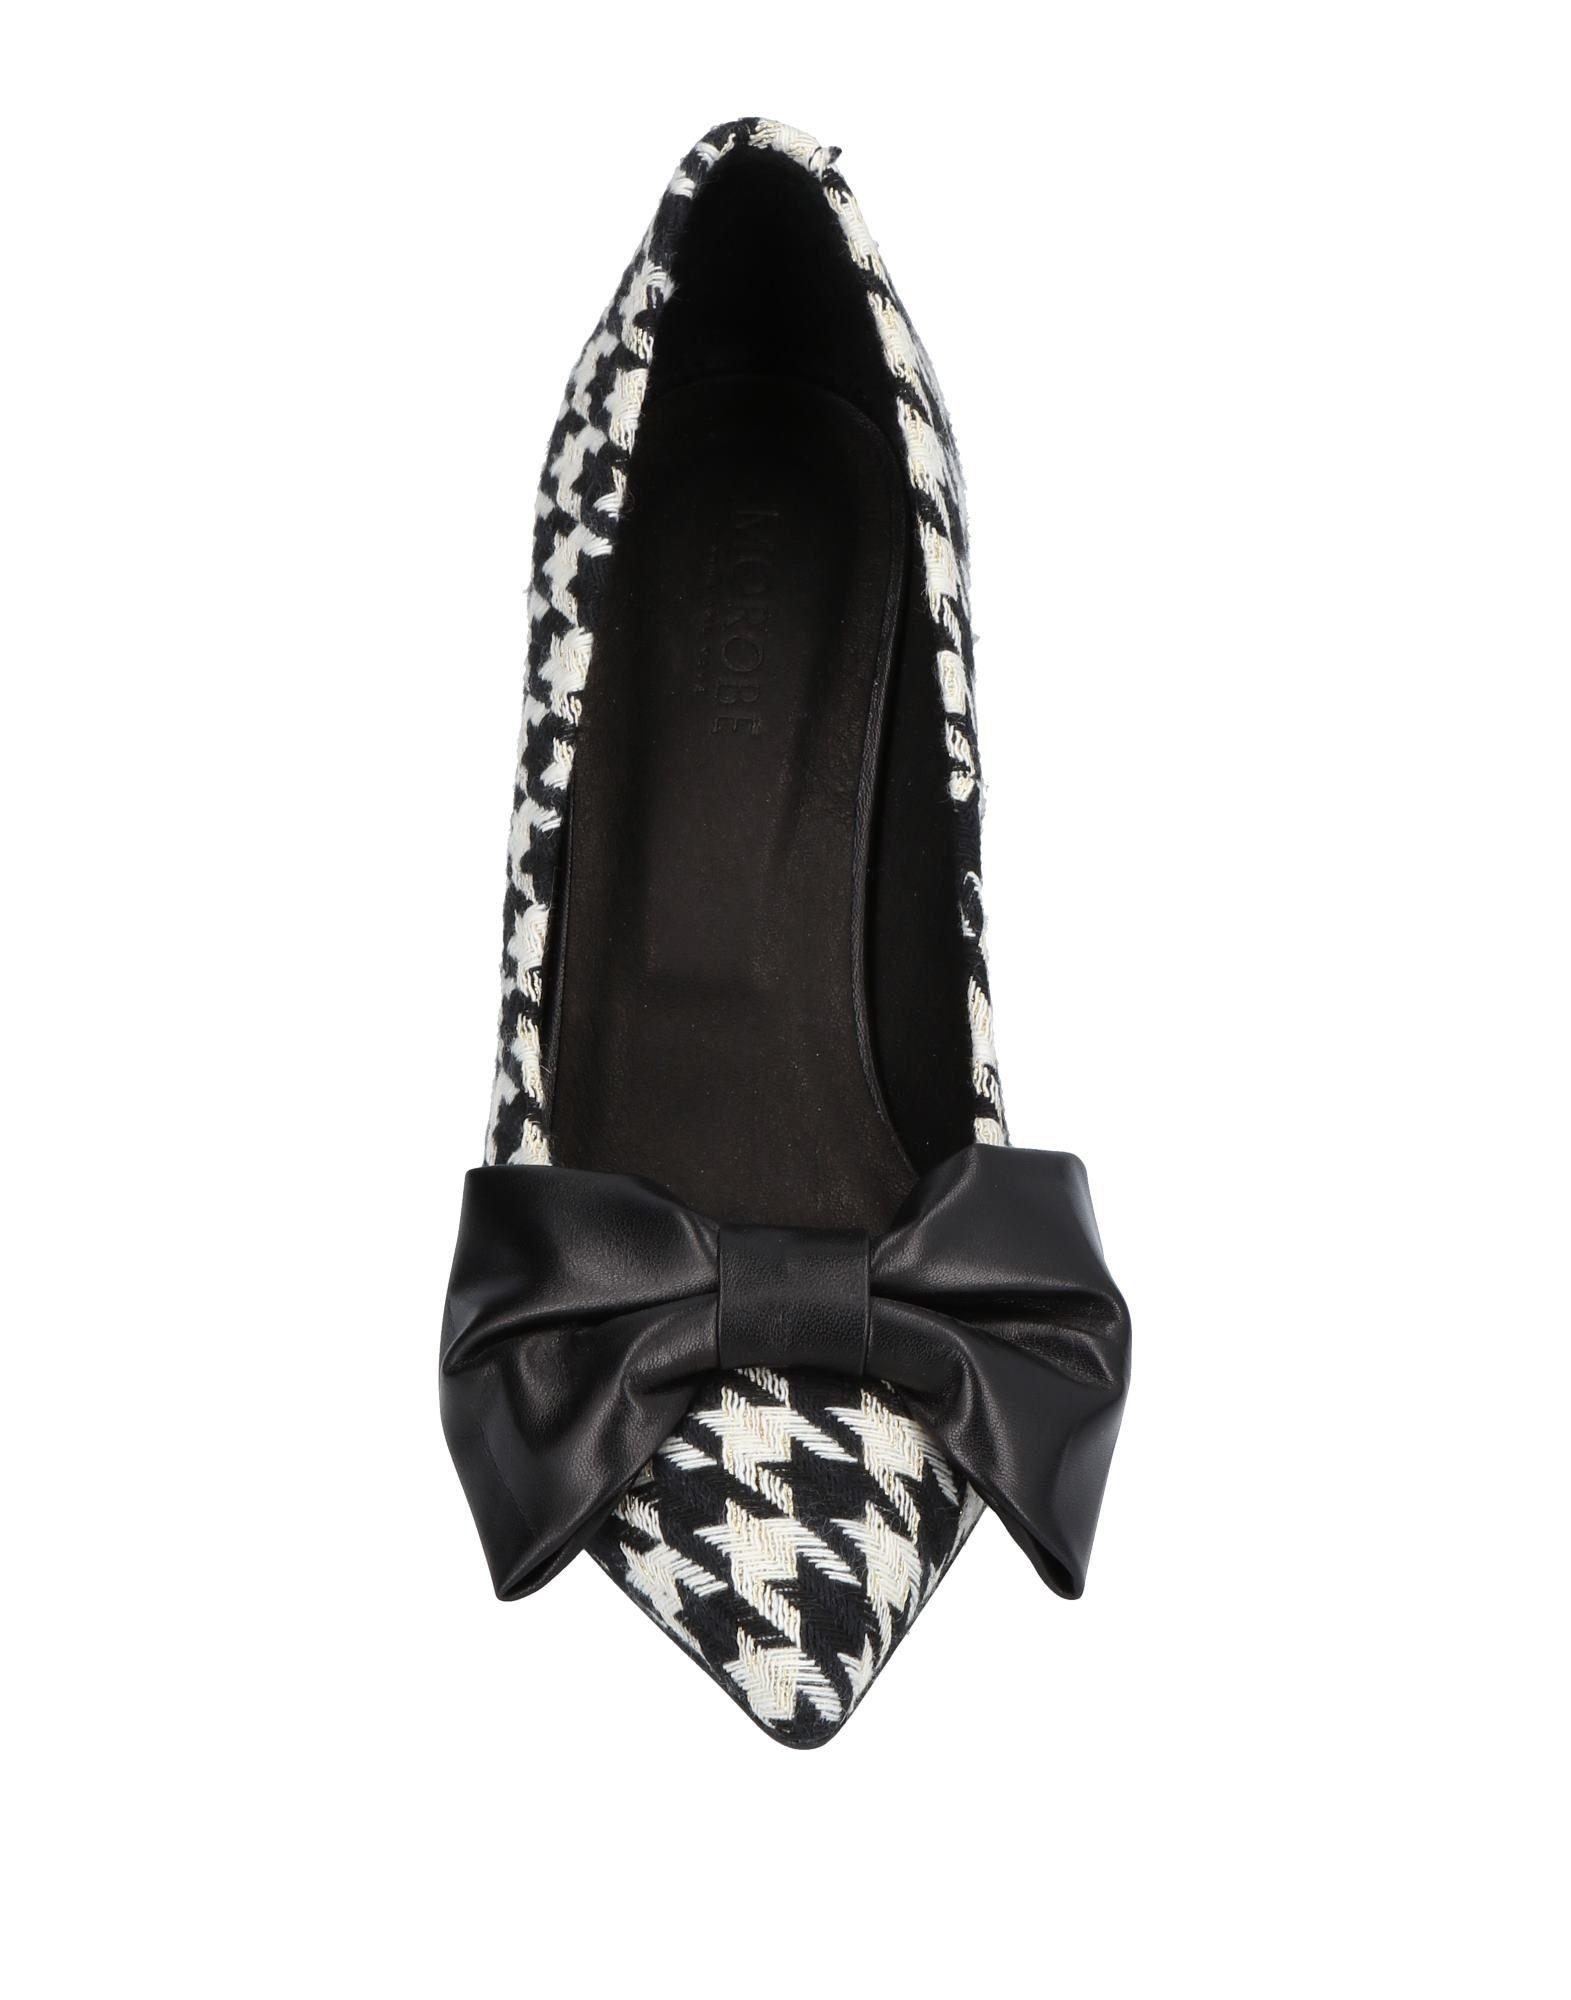 Morobē Pumps Qualität Damen  11450362US Gute Qualität Pumps beliebte Schuhe 21326d